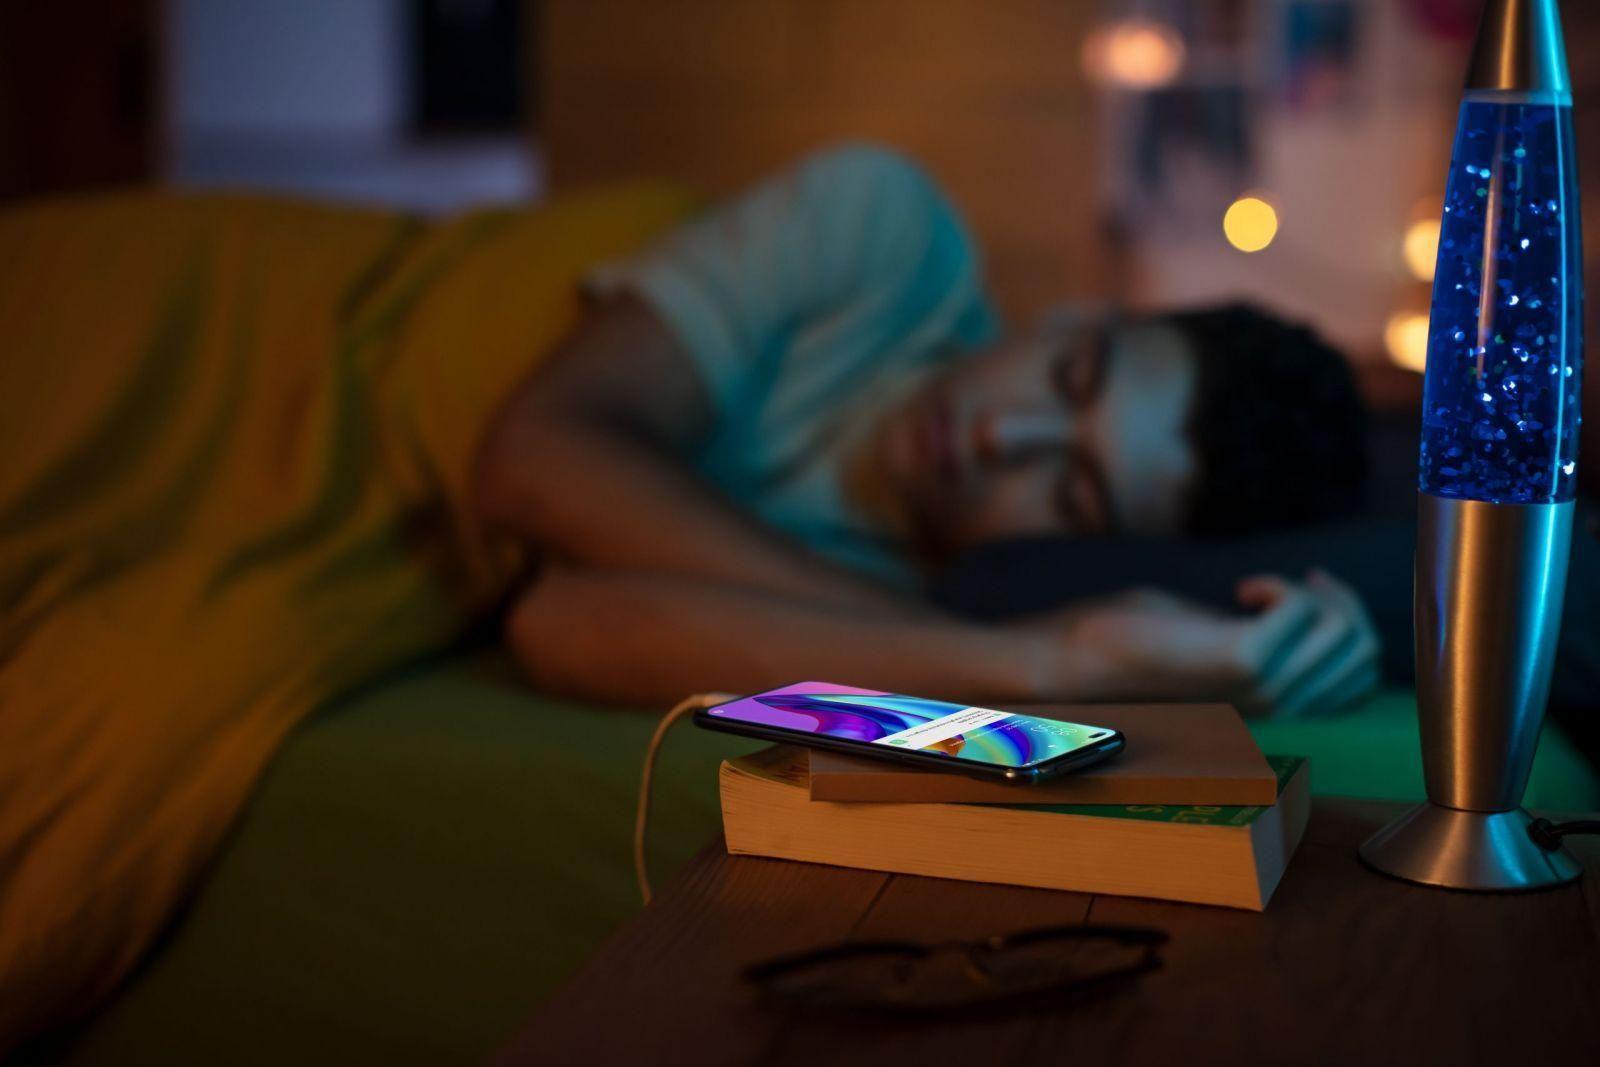 Oppo выпустил Reno4 Lite и Reno4 Pro 5G — первый 5G-смартфон OPPO в России (夜间充电AI Night Charging 1 scaled)